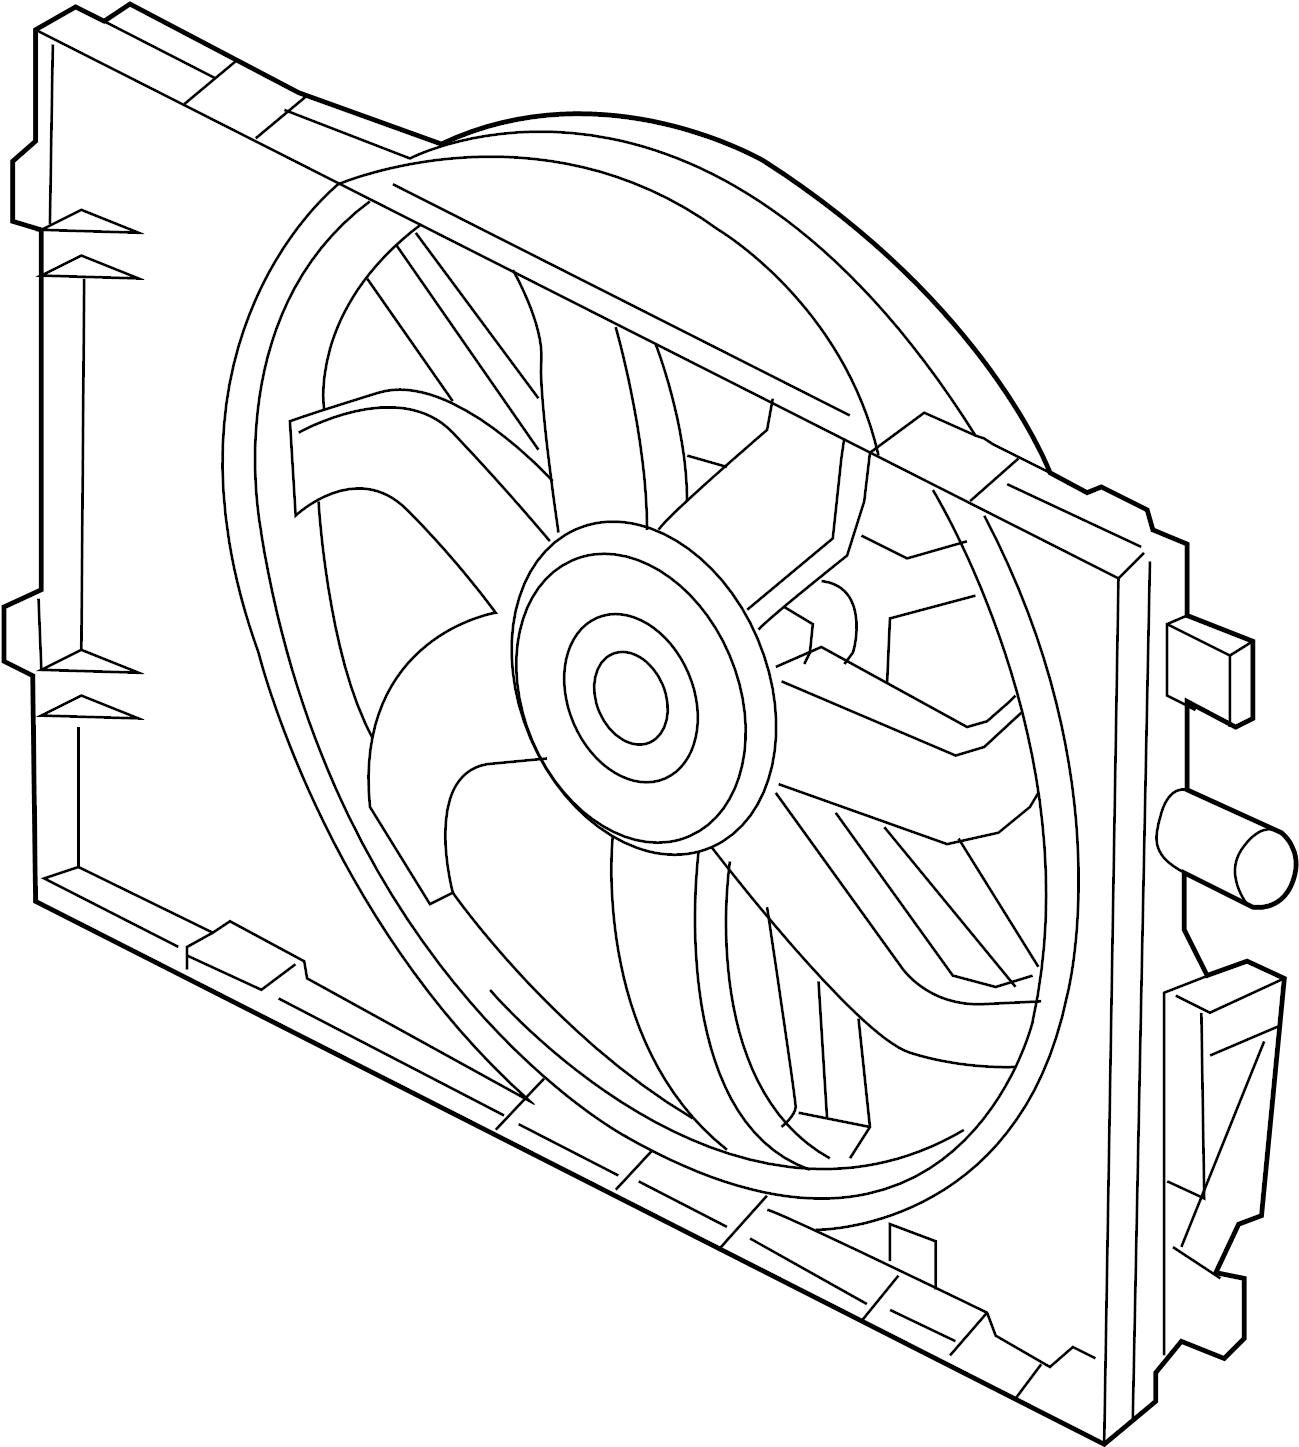 9e5z8c607c